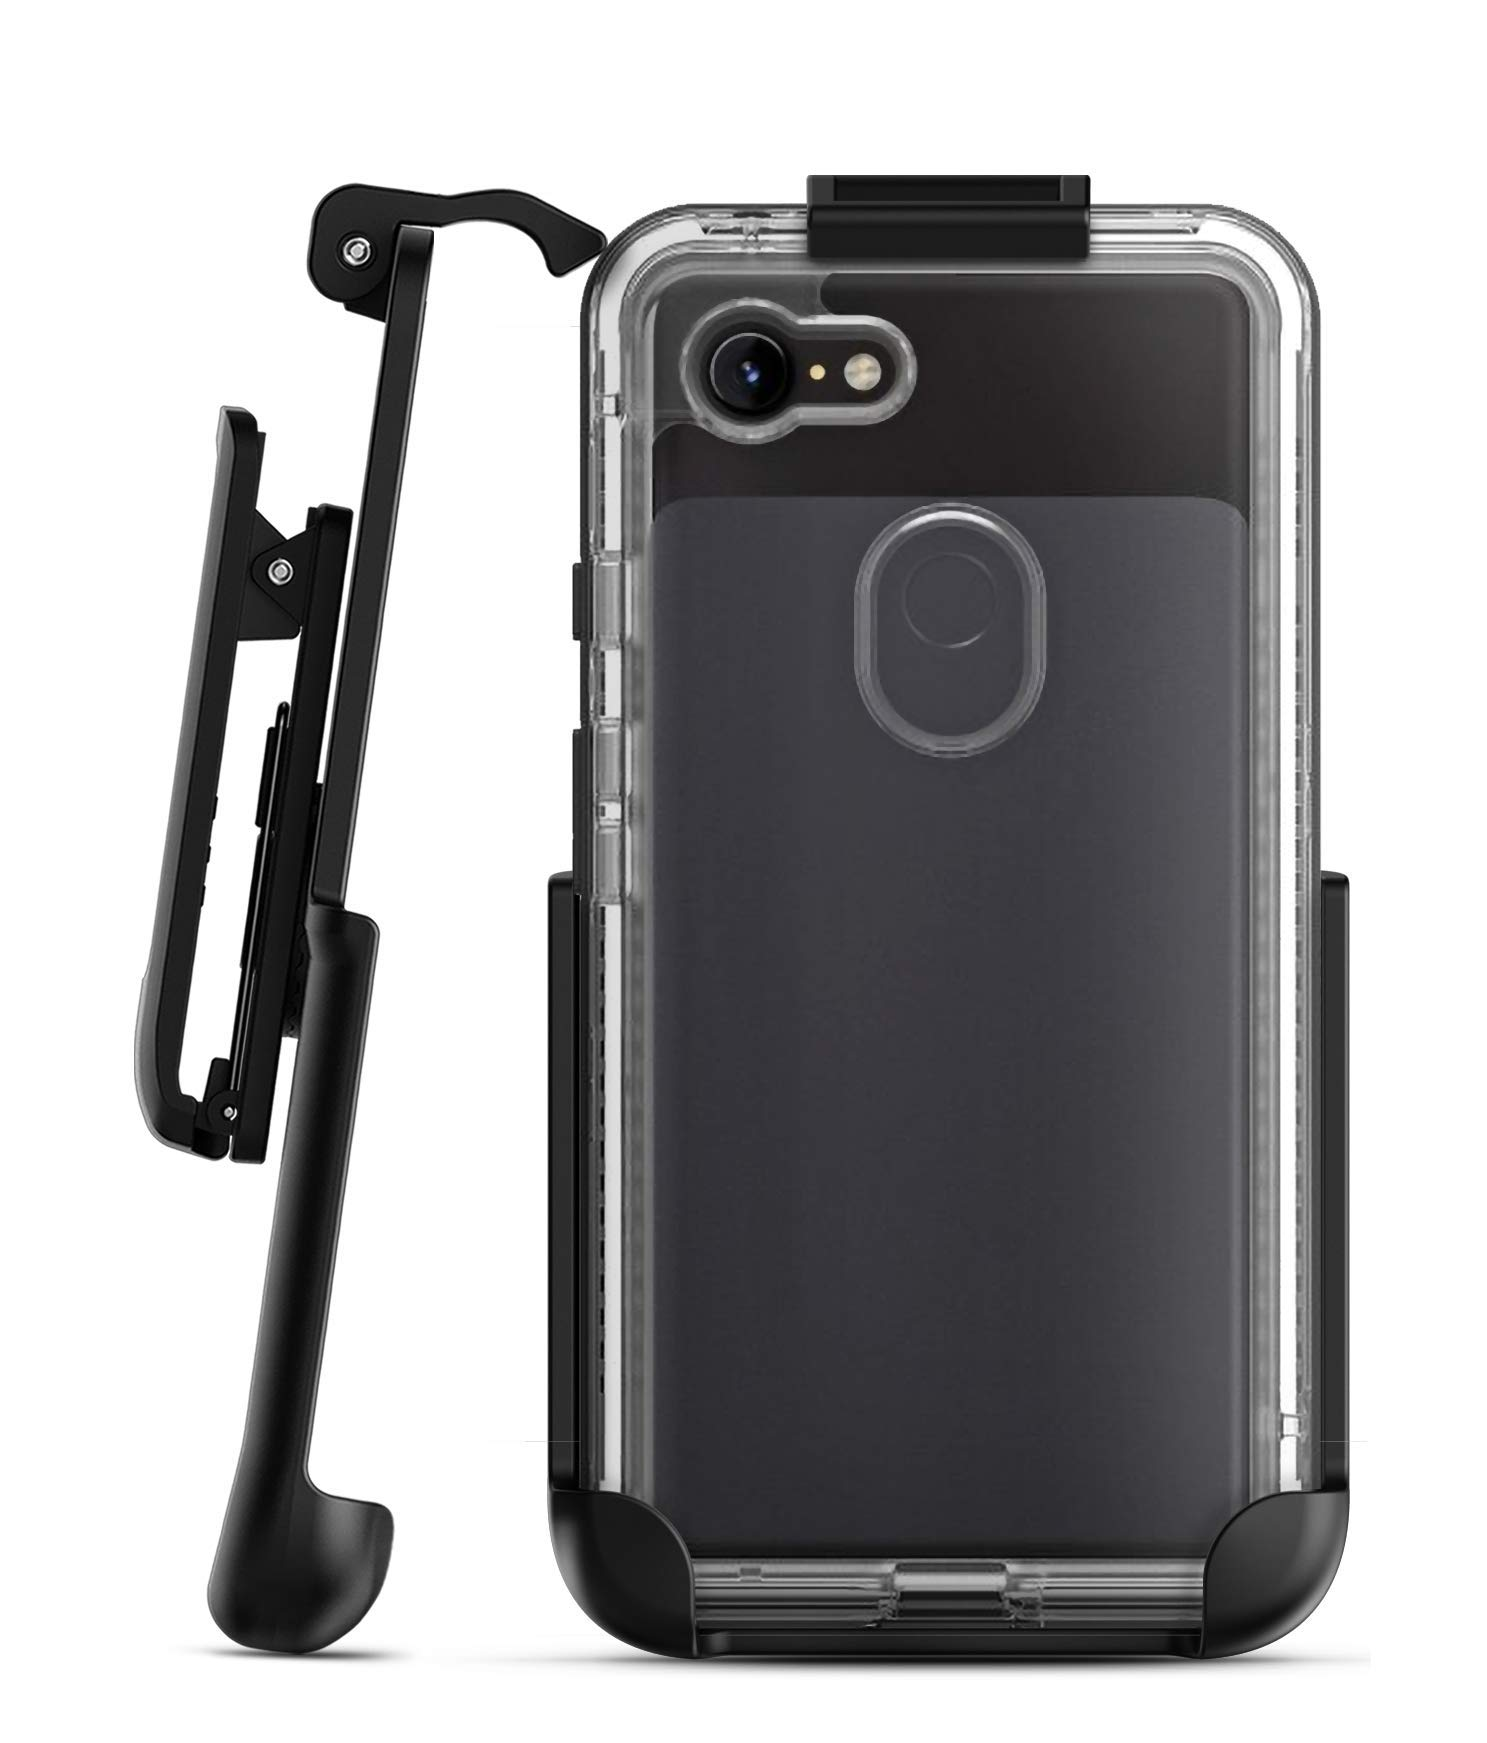 new concept 5c2f8 2a89f Google Pixel 3 XL Lifeproof Next Holster